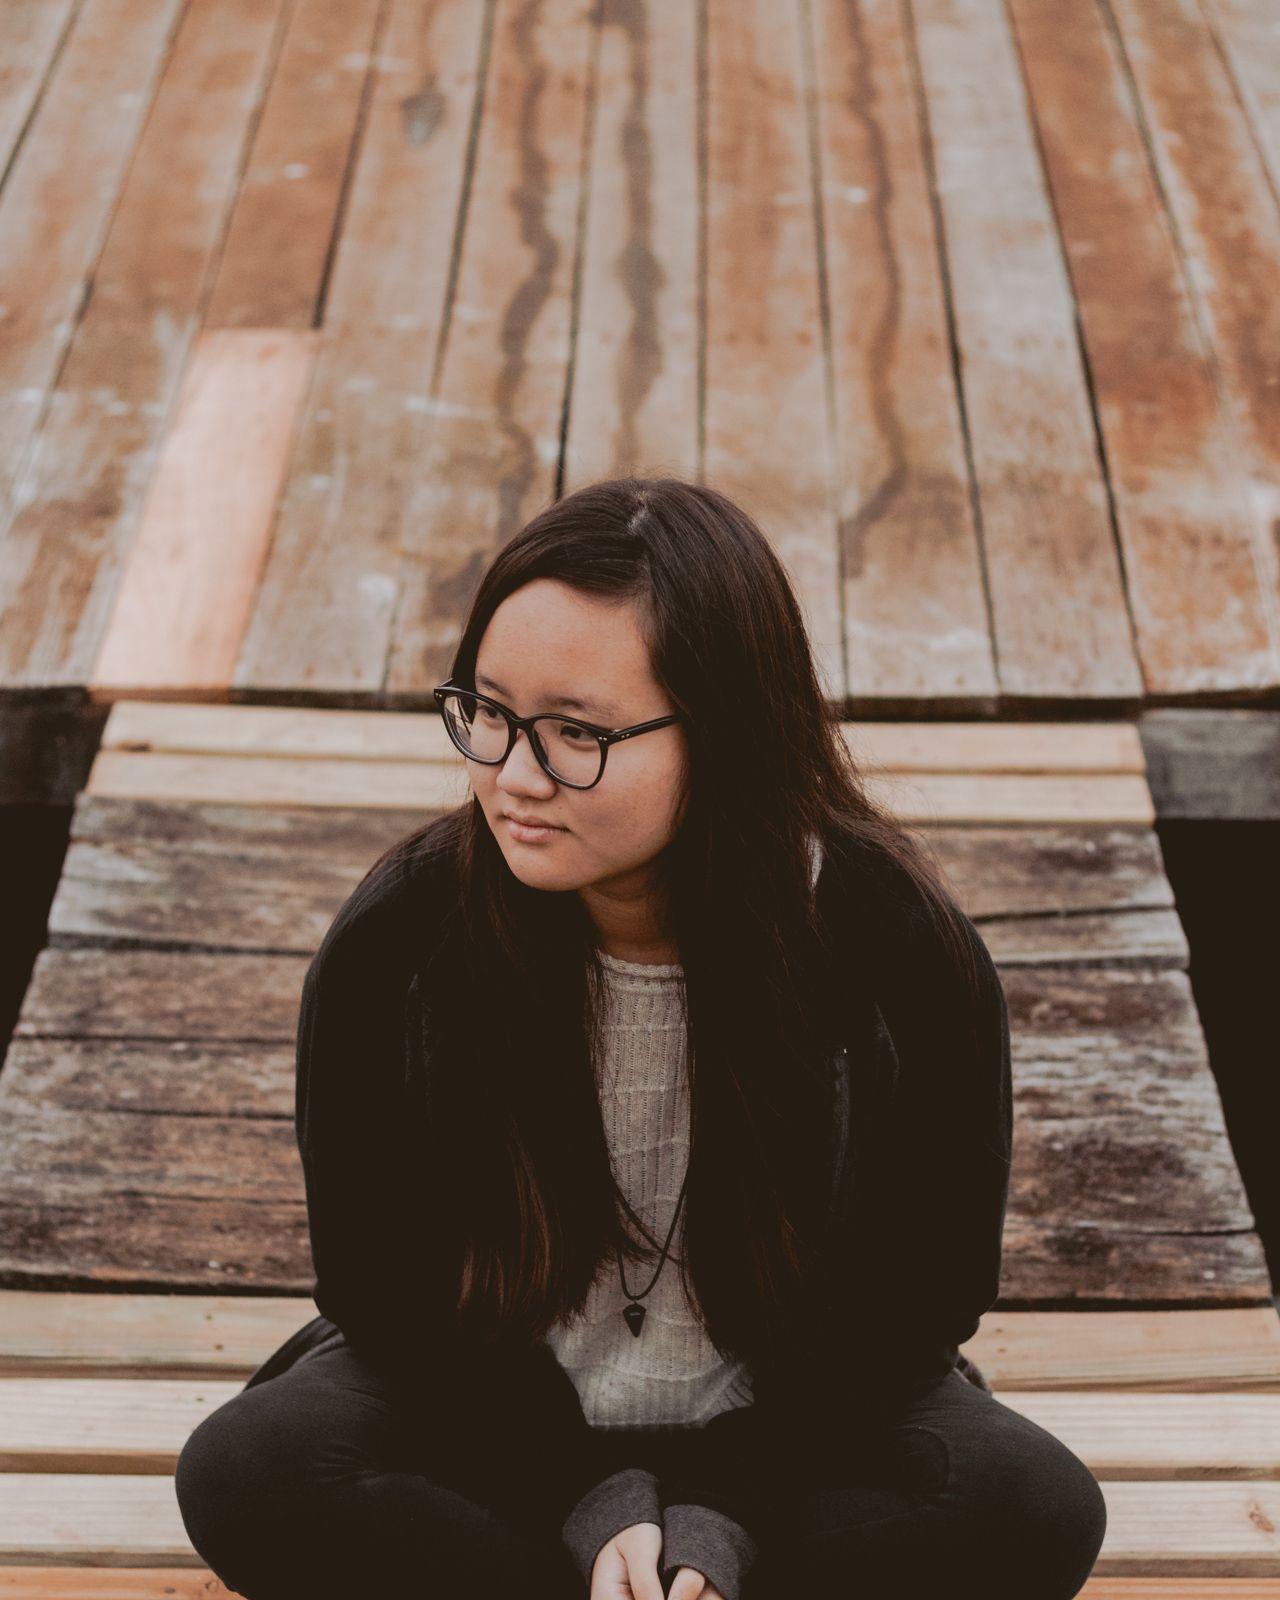 adolescente sentada piso madeira